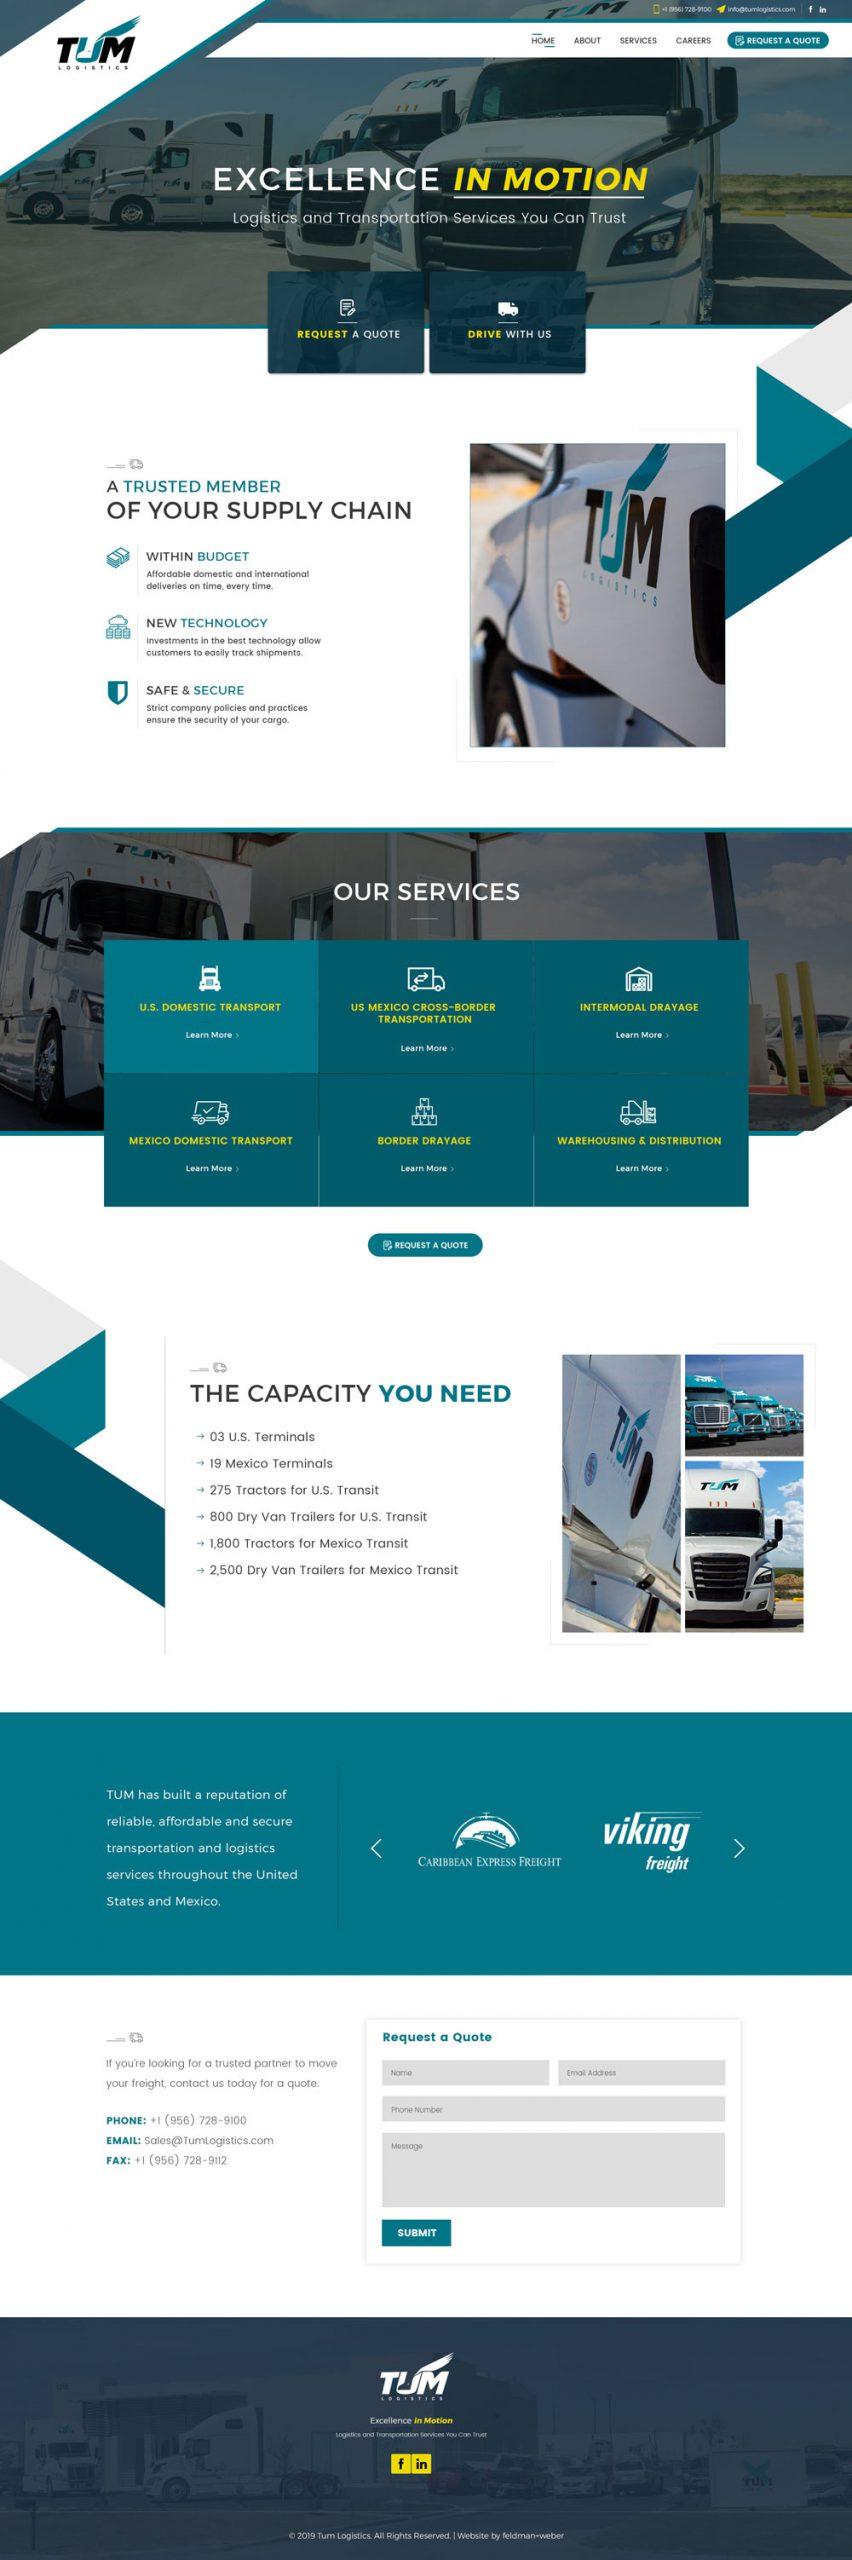 TUM Homepage